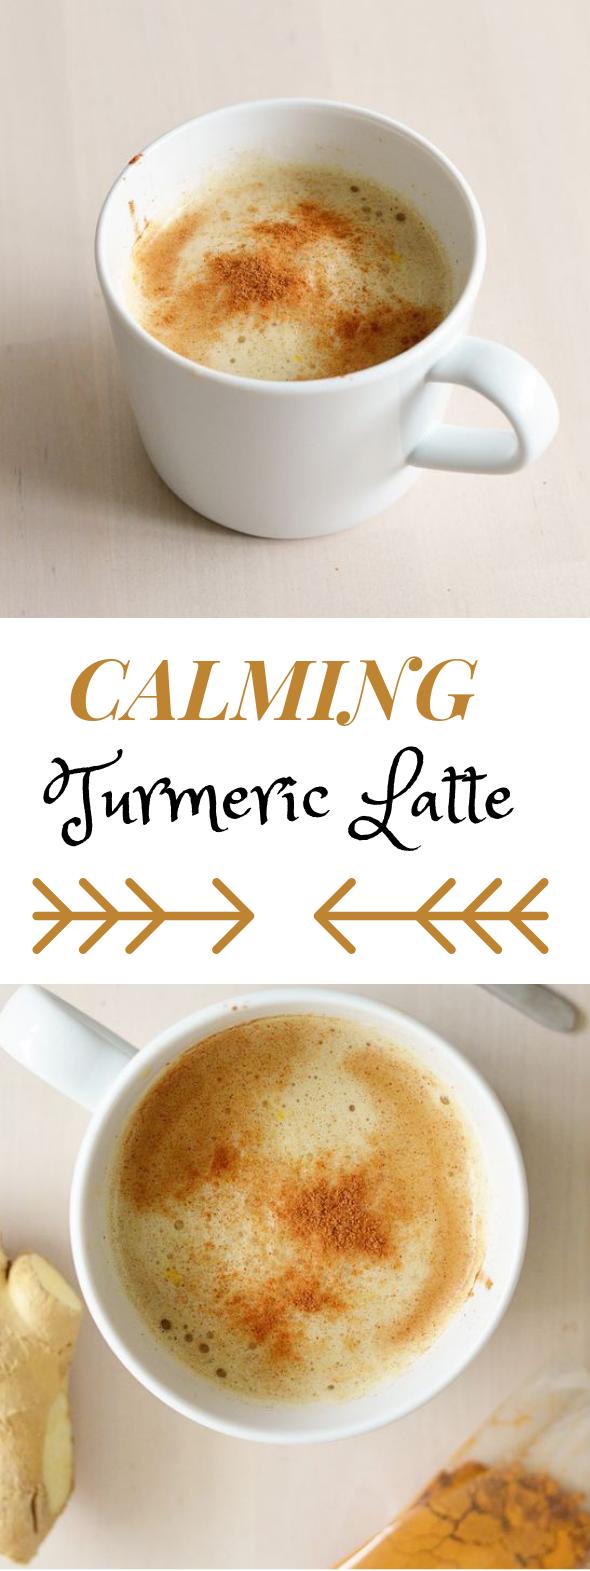 Turmeric Latte #drink #latte